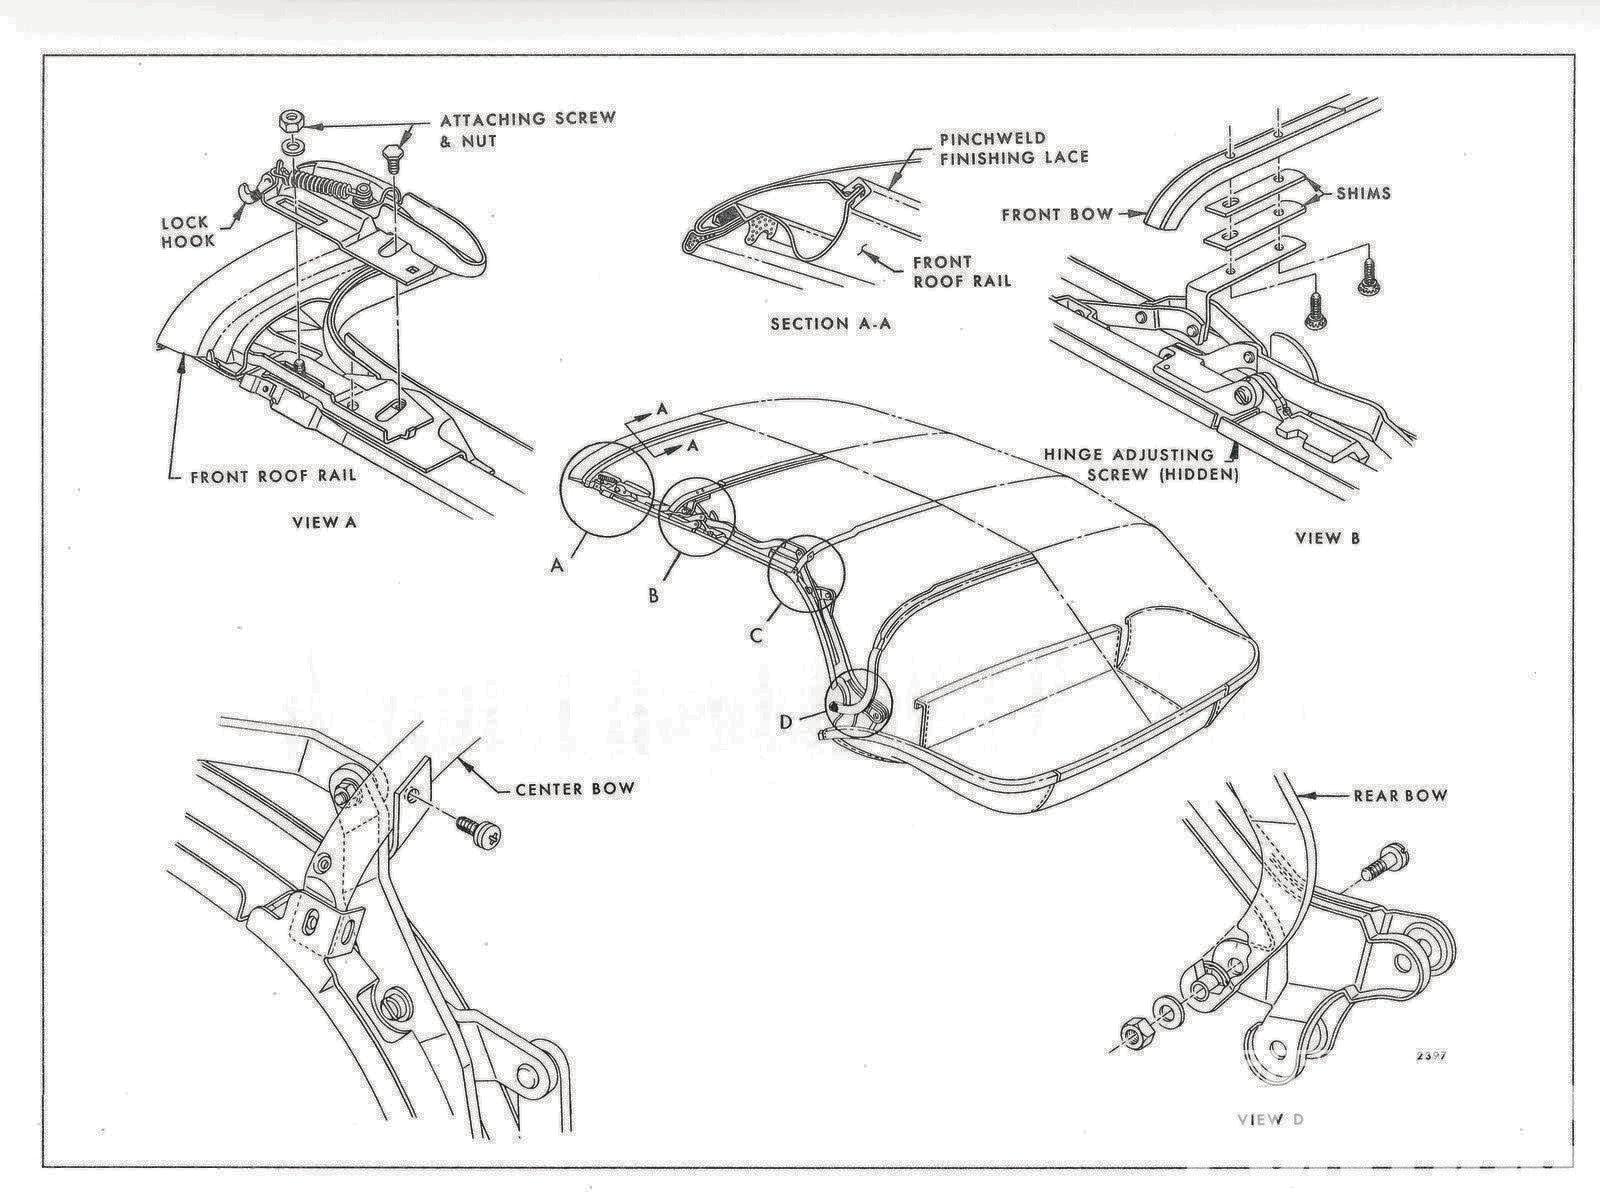 BY_2550] 1966 Impala Convertible Wiring DiagramAtion Usly Osuri Cana Sand Ynthe Sapre Vesi Para Numap Mohammedshrine  Librar Wiring 101